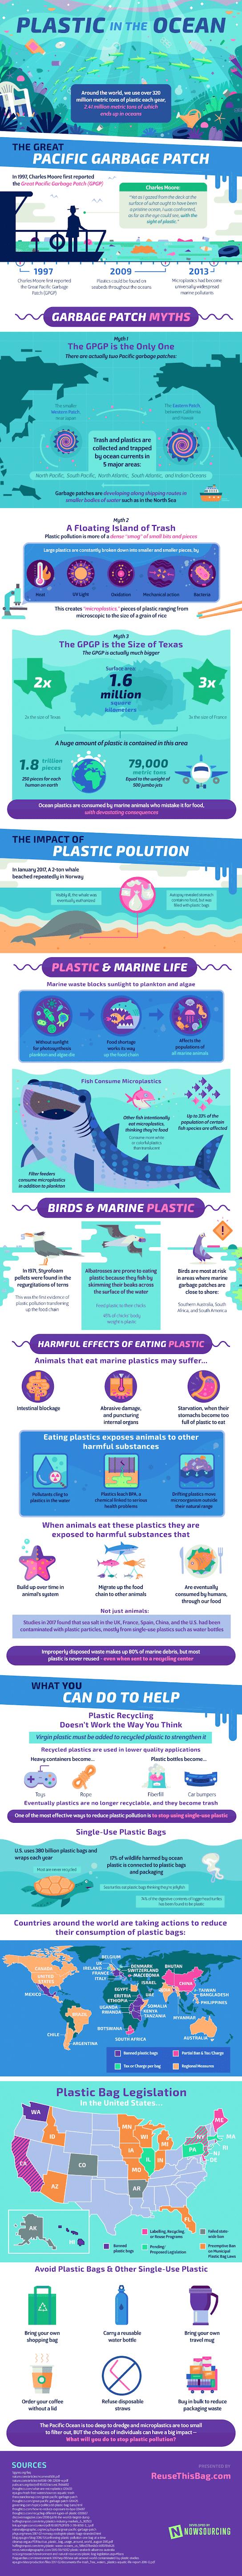 Plastic In The Ocean #infographic